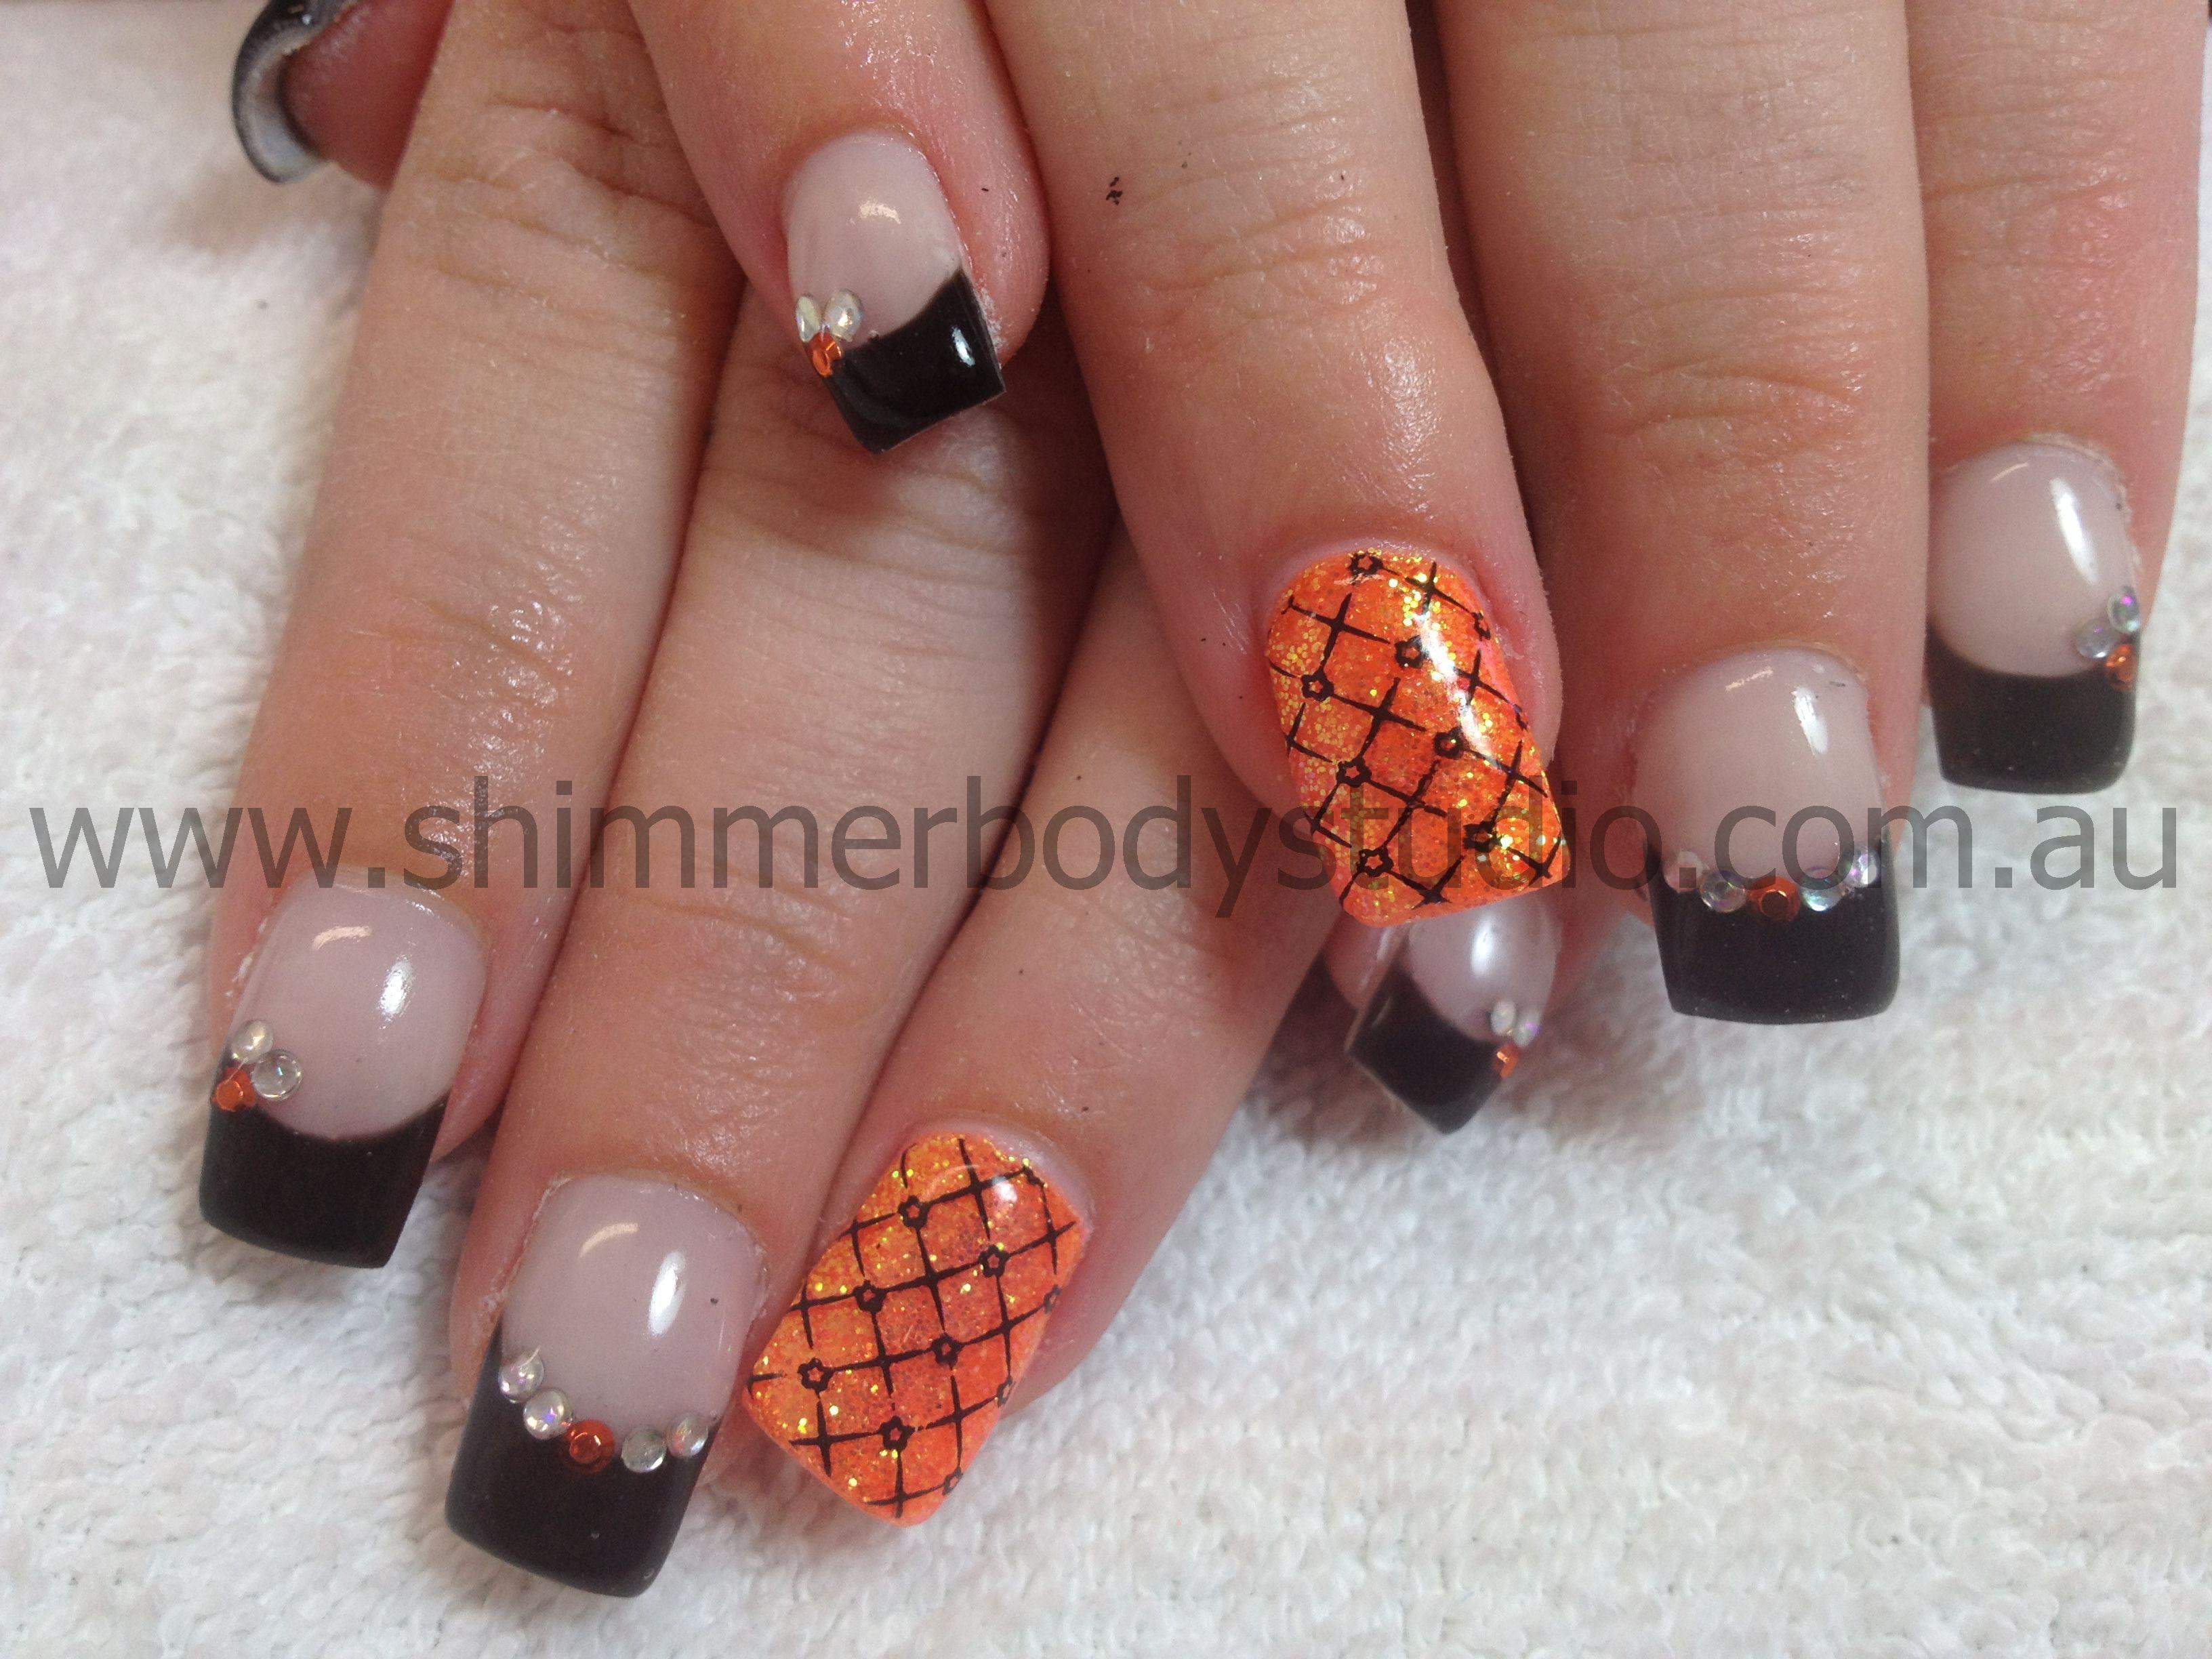 Gel Nails, Glitter nails, black and orange nails, crystals ...